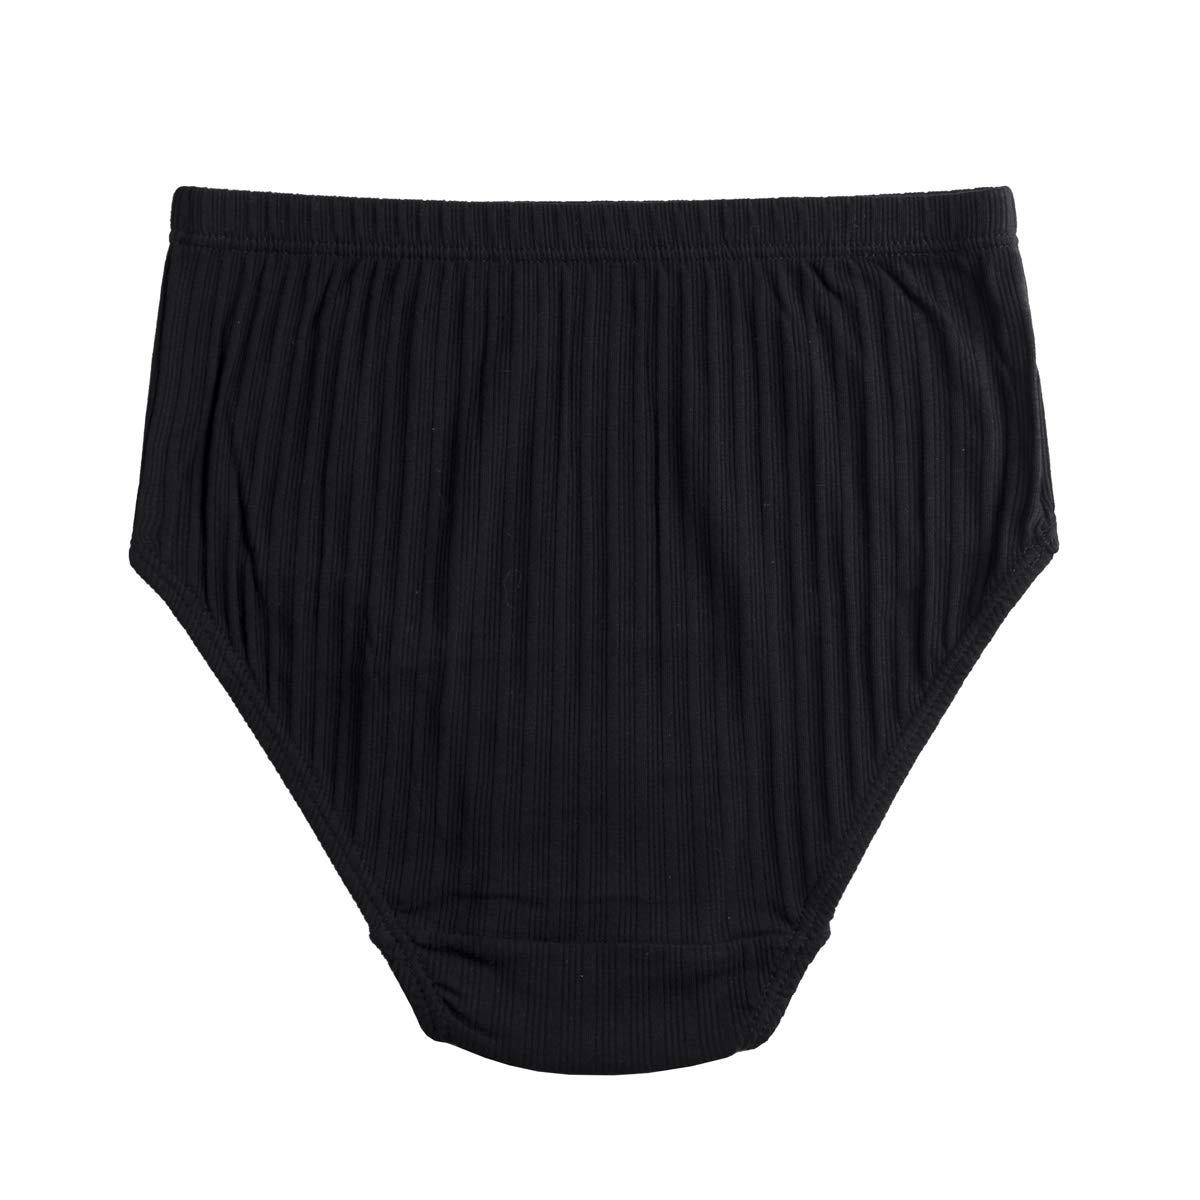 cc7459ecffb Knitlord Women's Plus Size Underwear Cotton 6 Pack Comfort Briefs Panties  (XL, Black 6pk): Amazon.ca: Clothing & Accessories